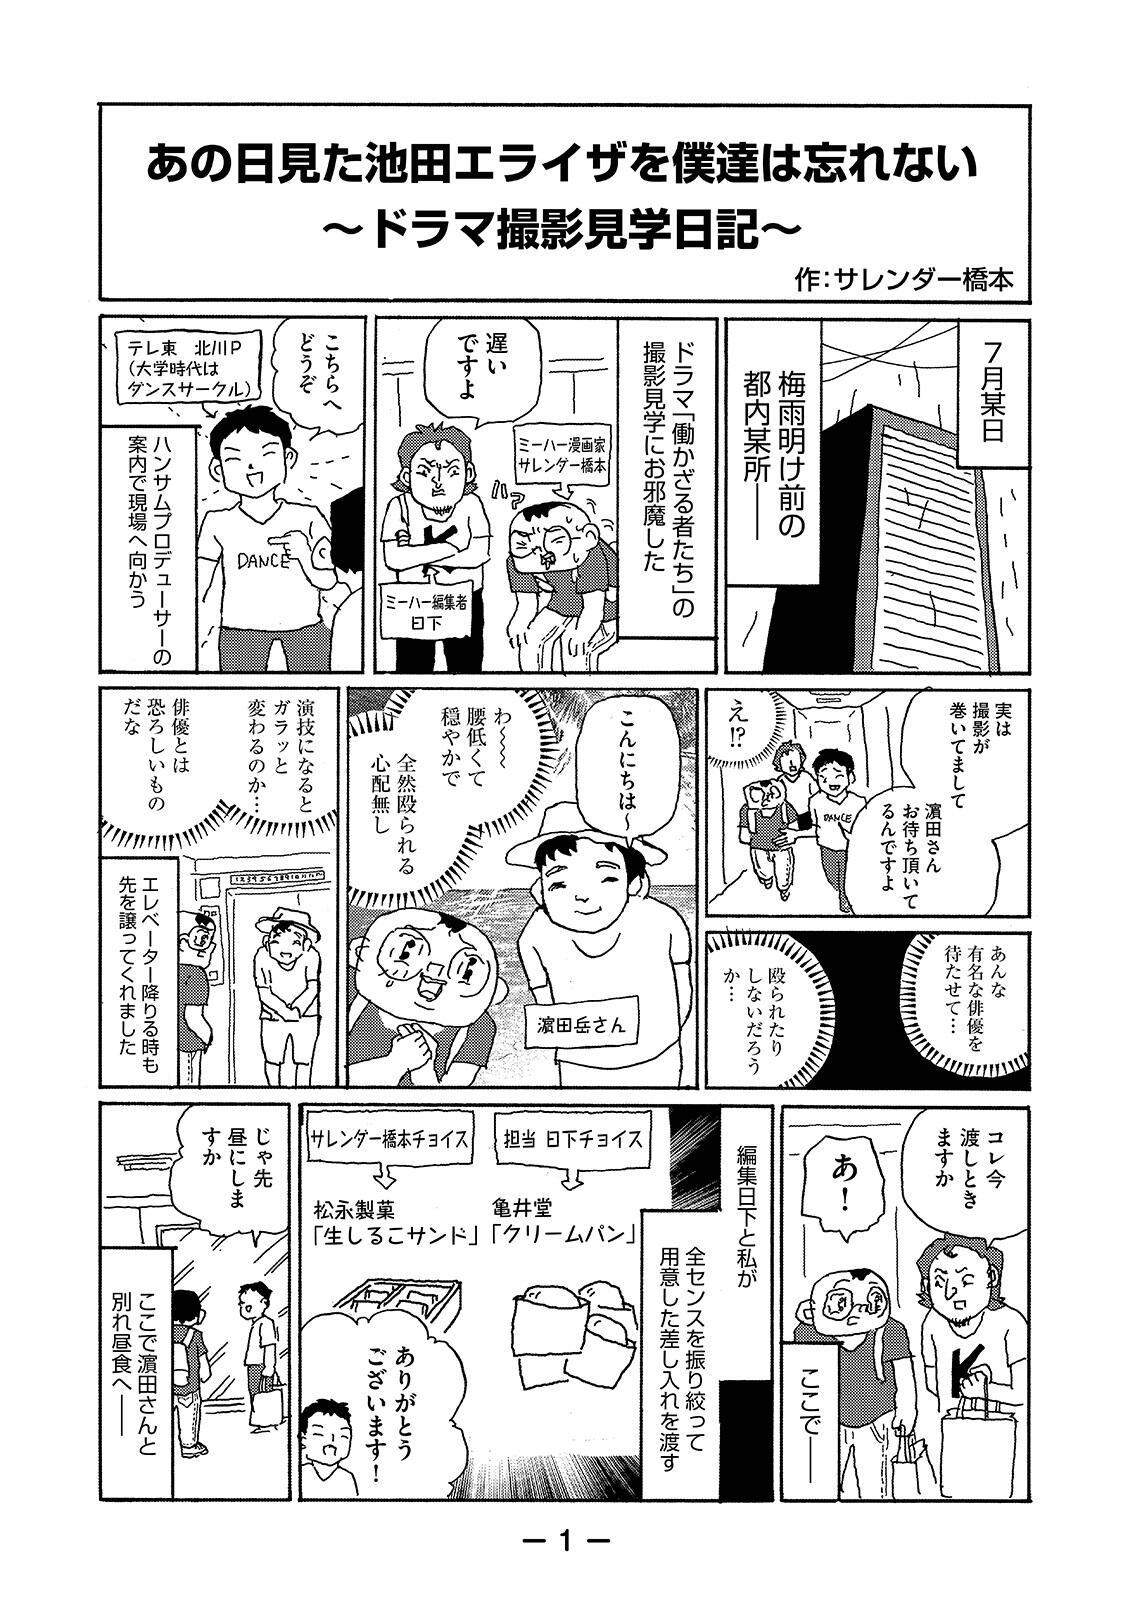 20200821_hatarakazaru_02.jpg